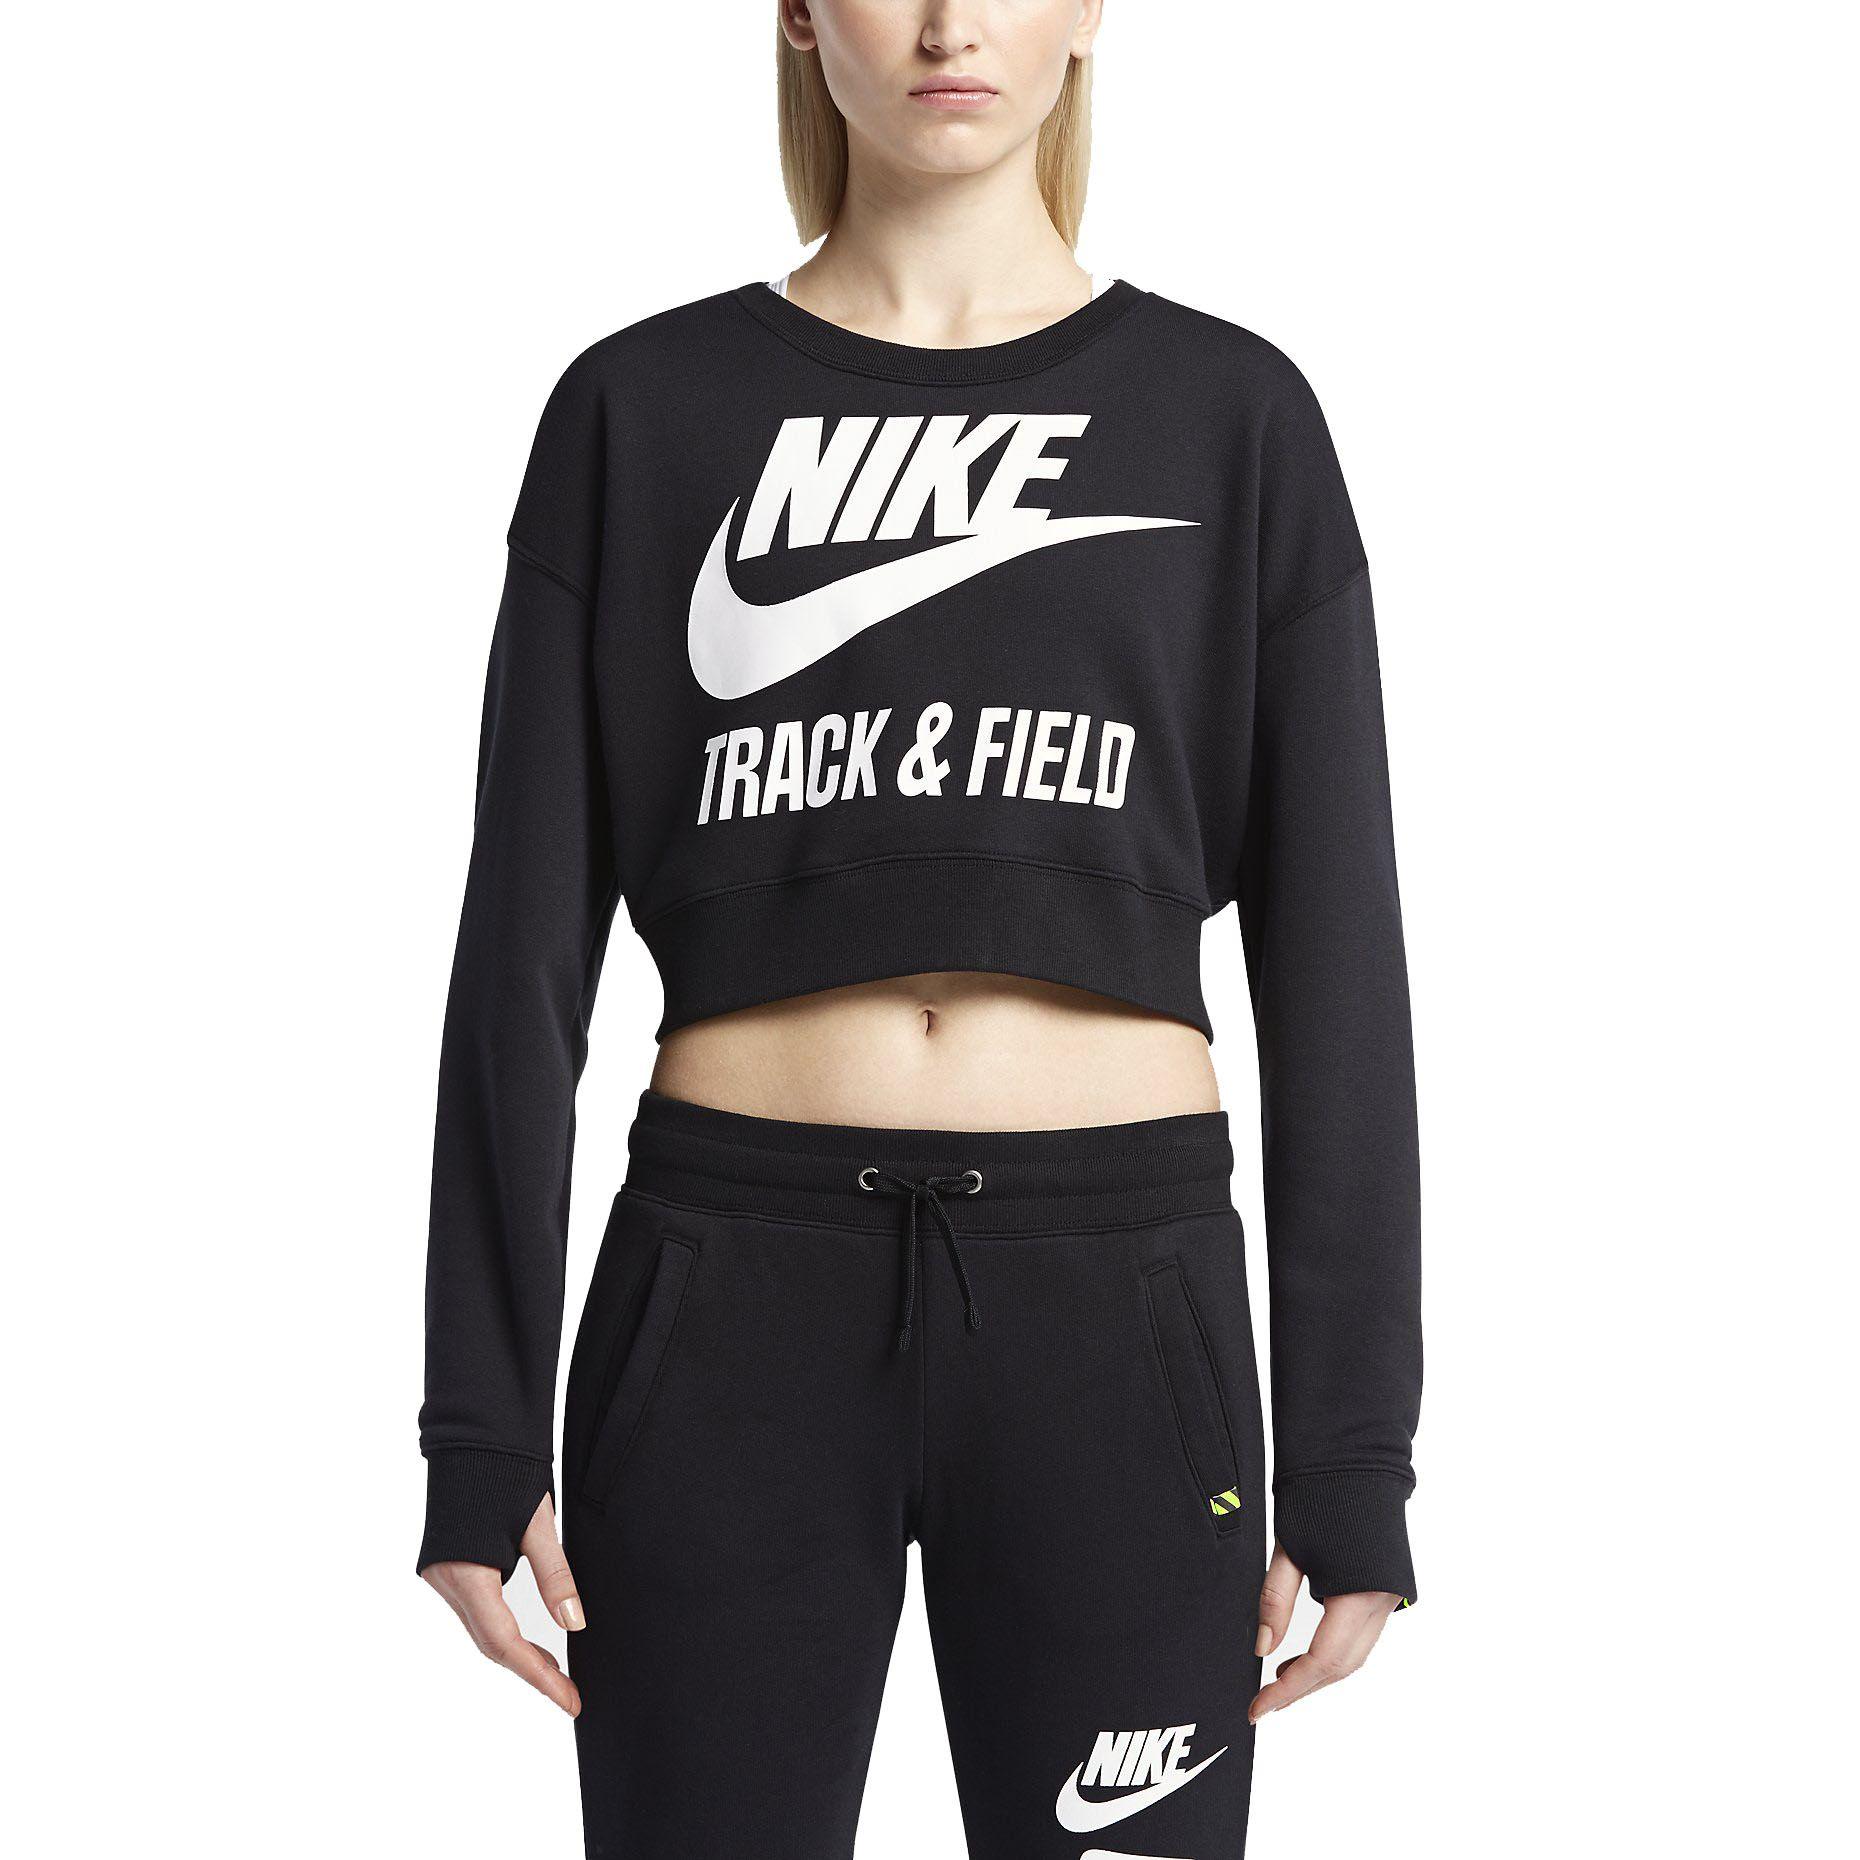 Women's Top - Nike Track and Field Crew - Black/Black/Black/Black